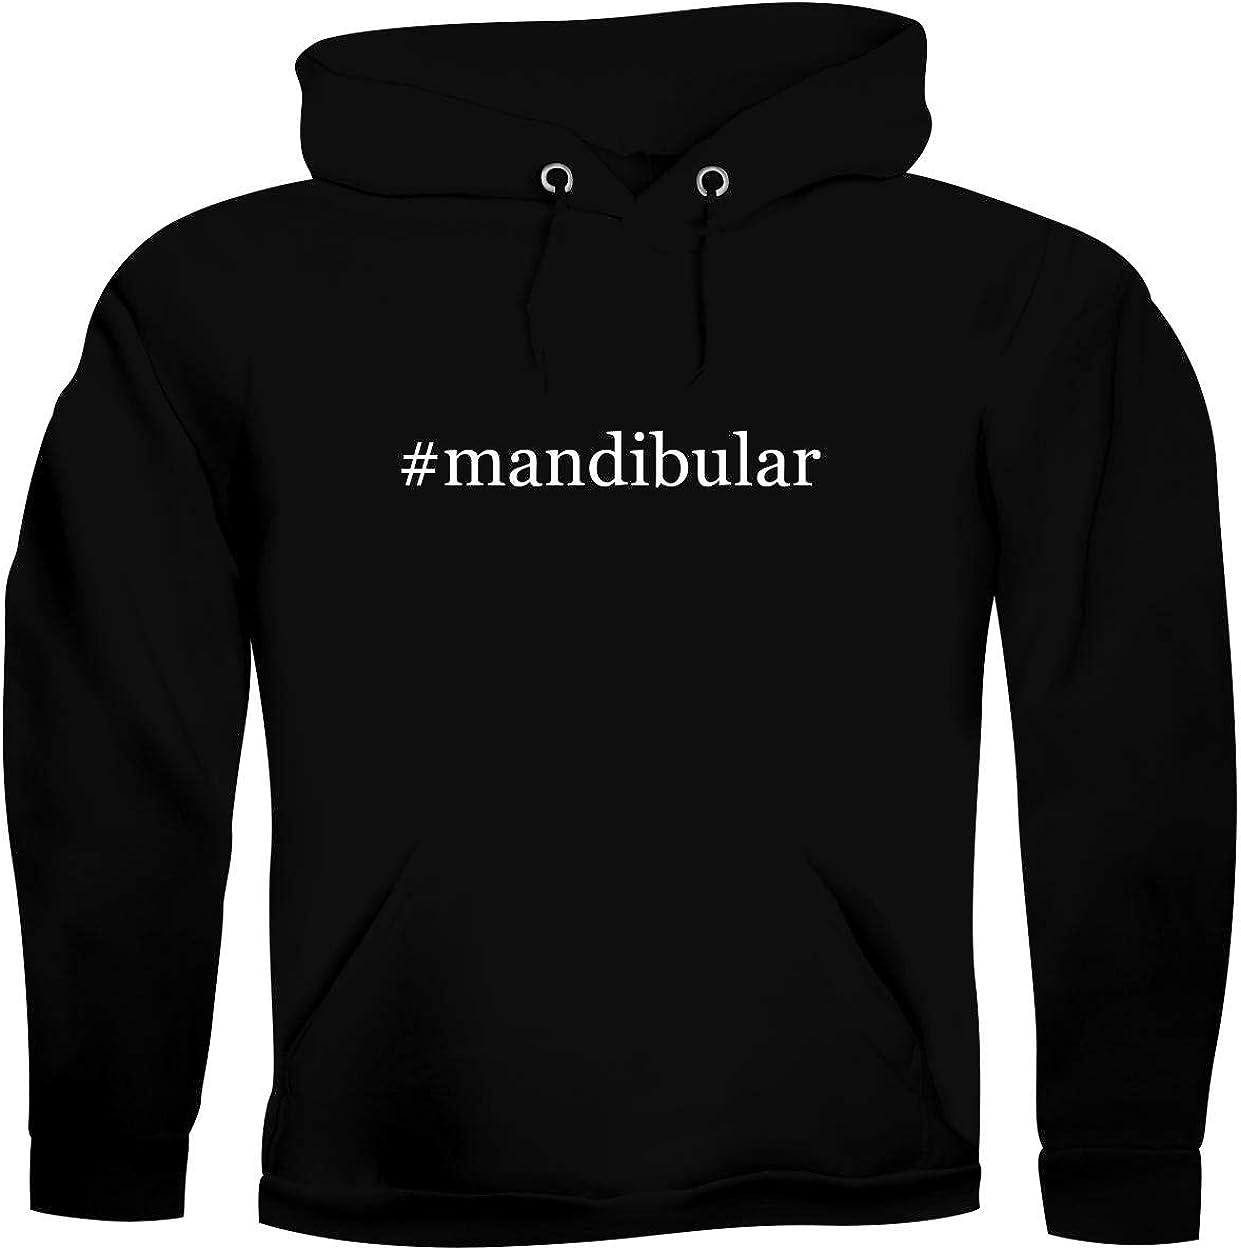 #mandibular - Men's Hashtag Ultra Soft Hoodie Sweatshirt